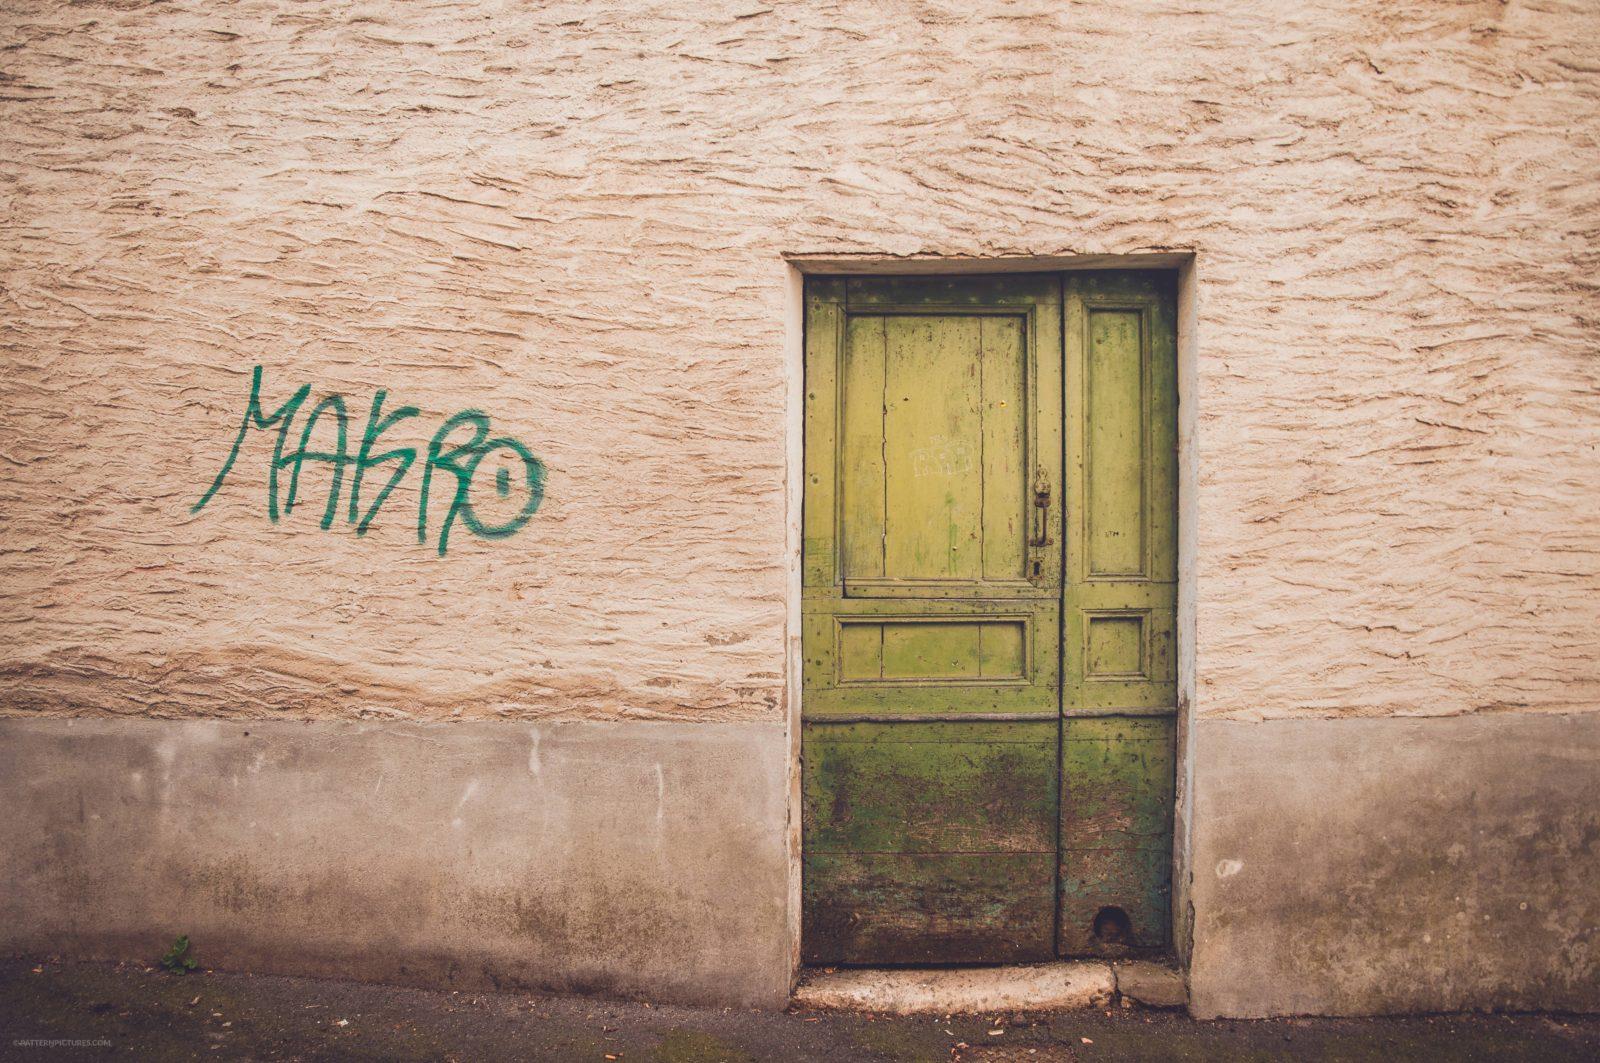 Green door and grafiti urban scene